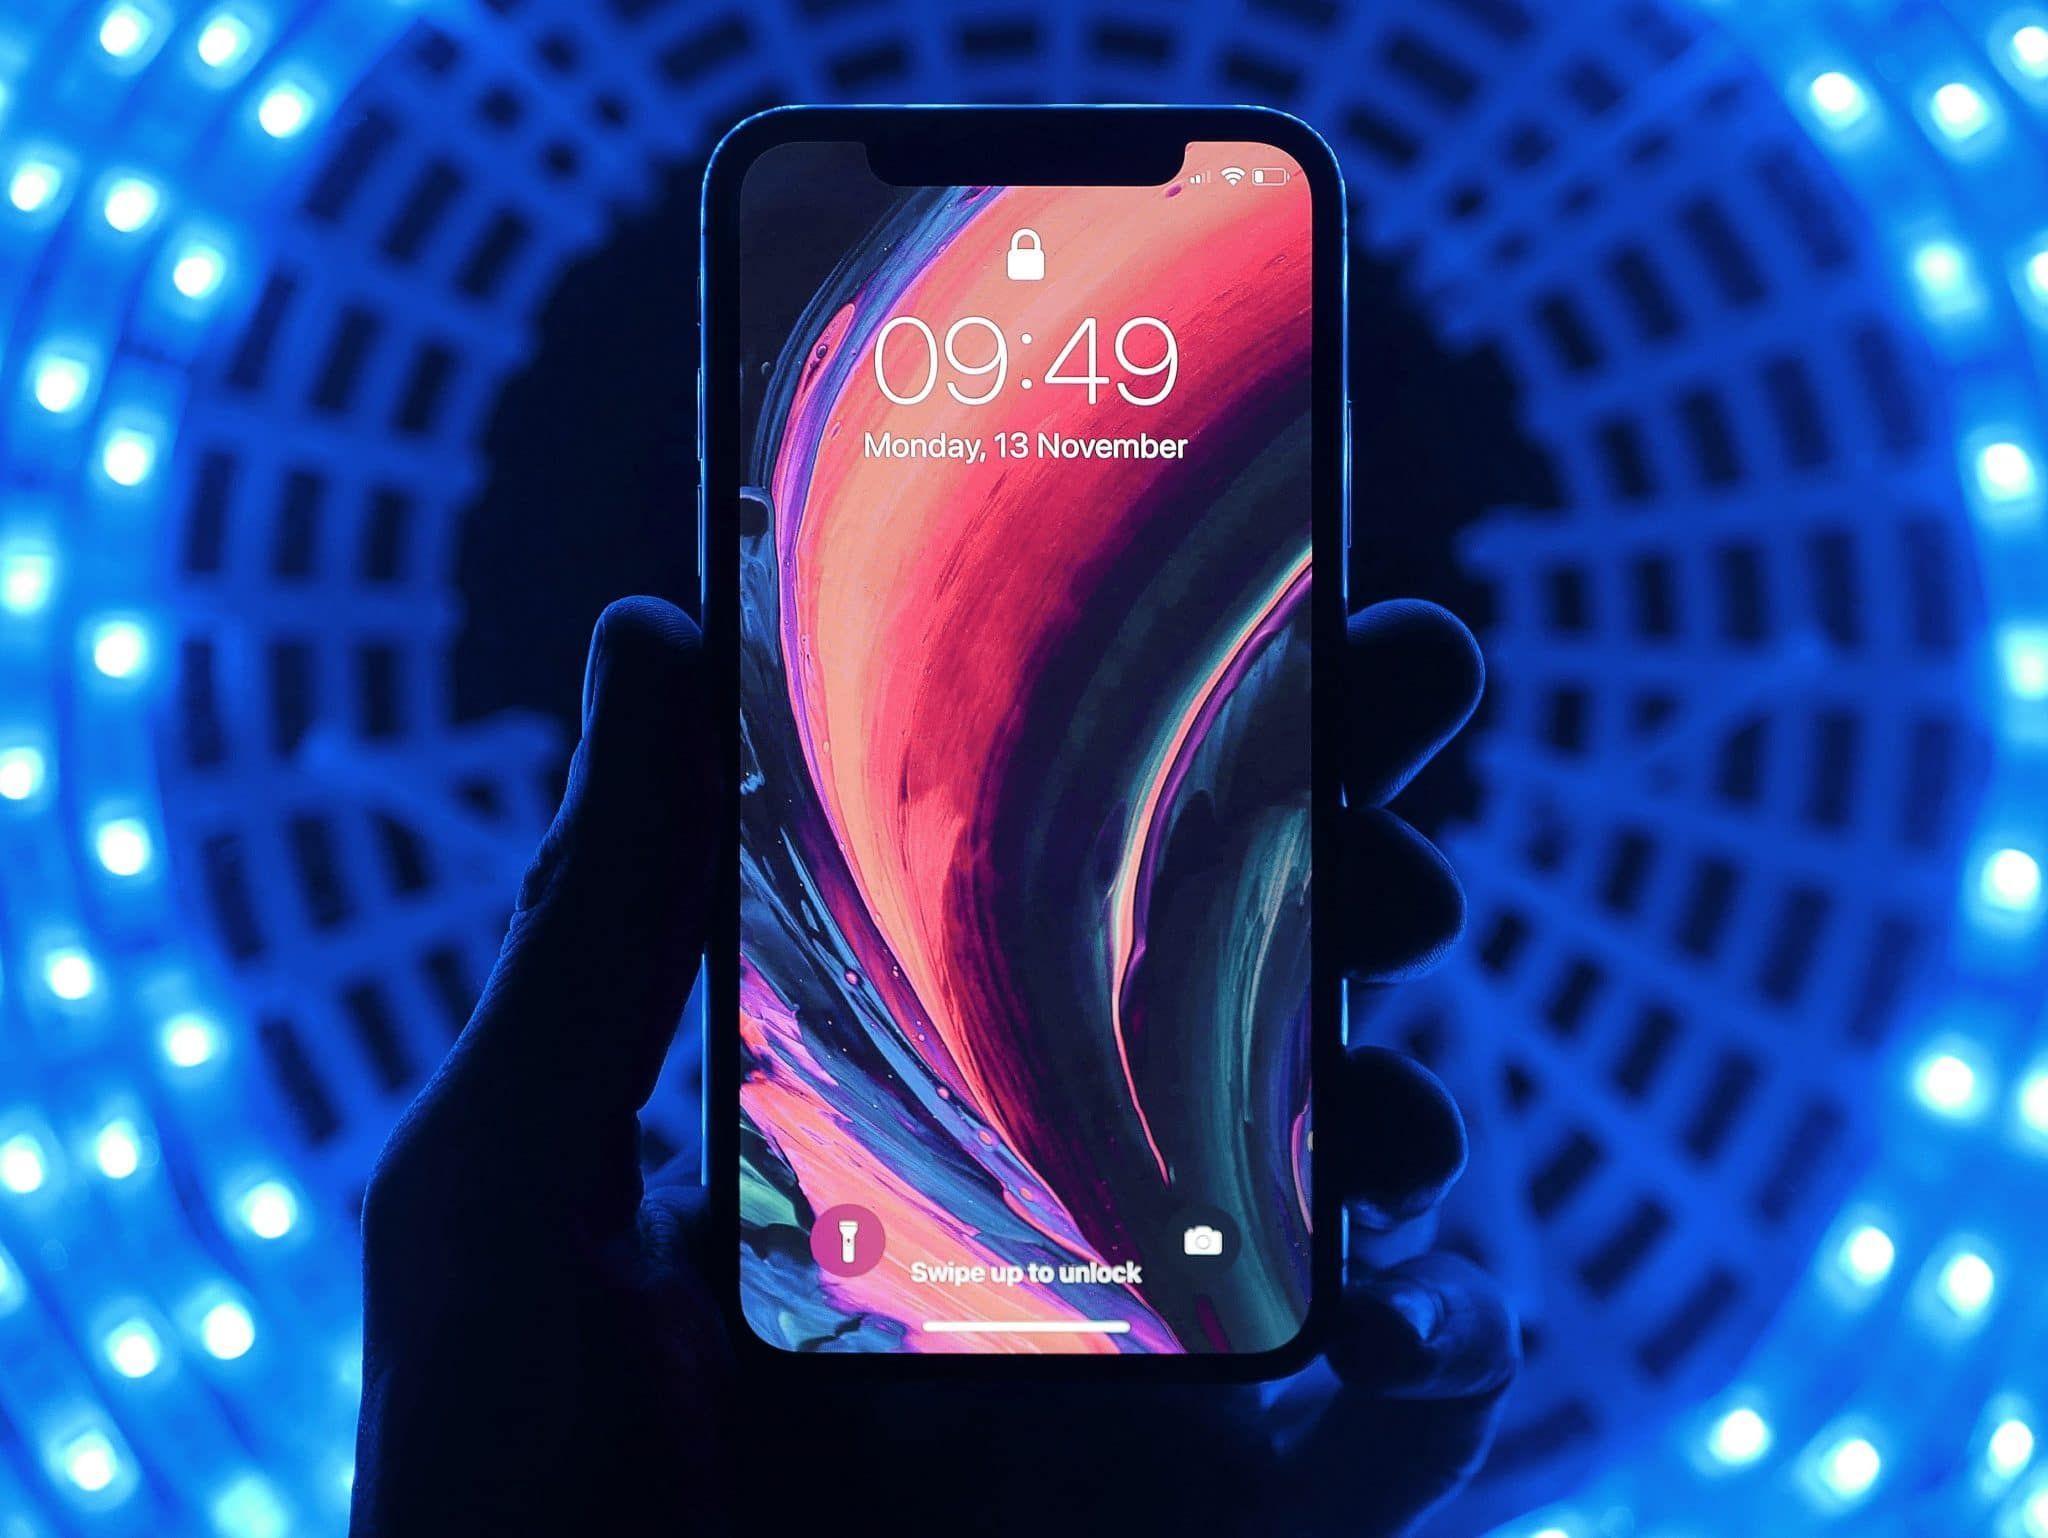 More than Screen Time Digital Wellness in iOS 12 Iphone